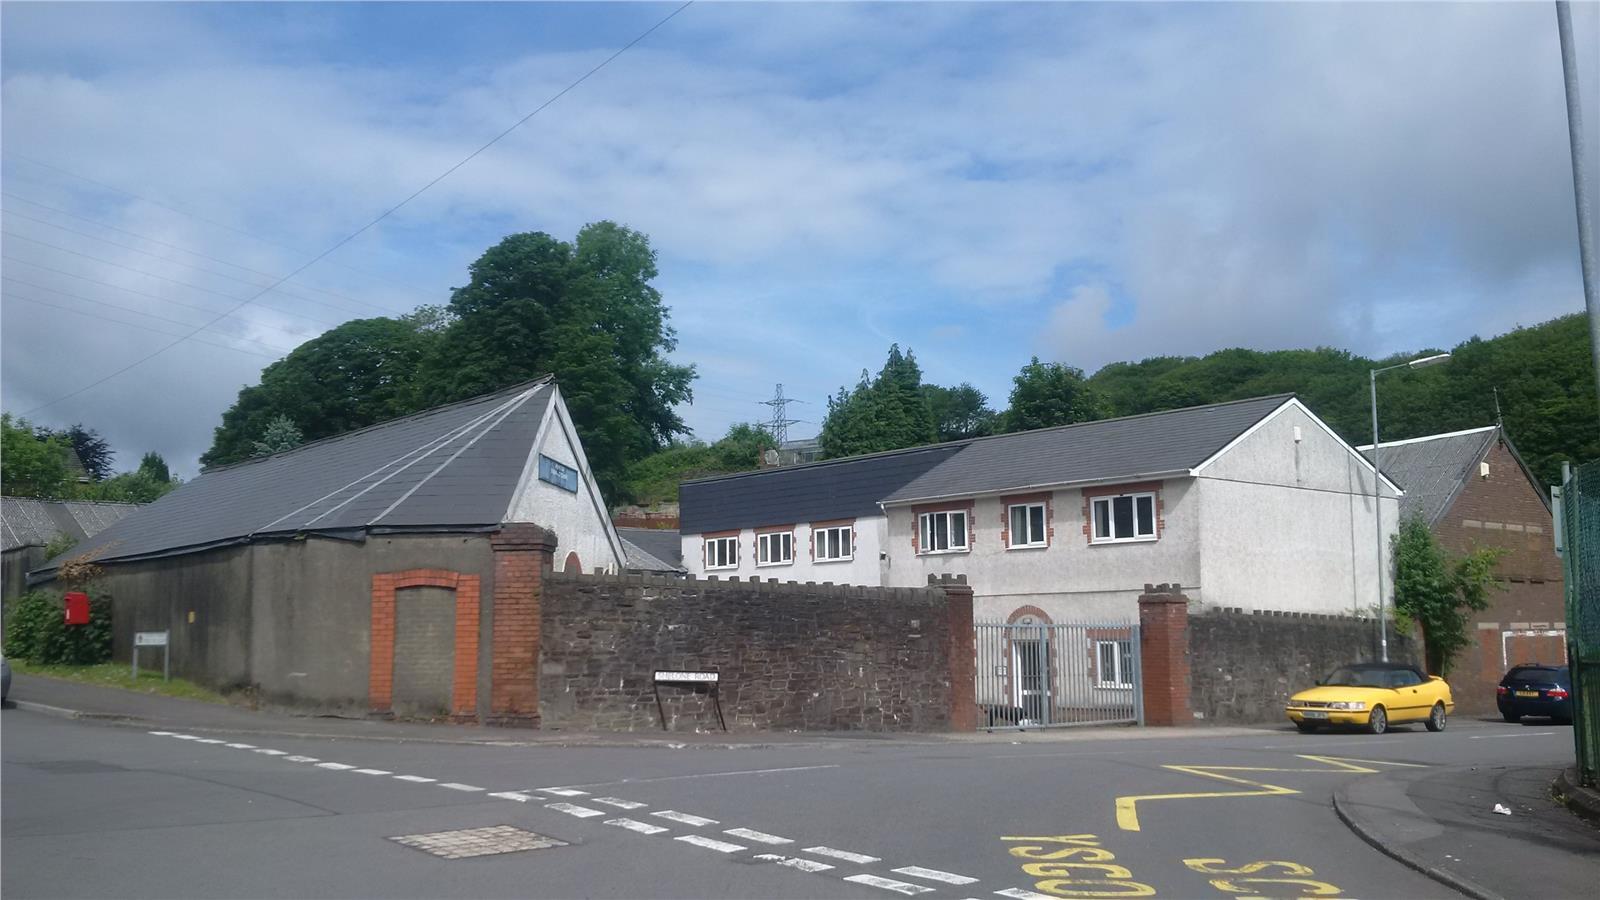 Morvern Business Centre Church Street, Neath, West Glamorgan, SA11 2JP